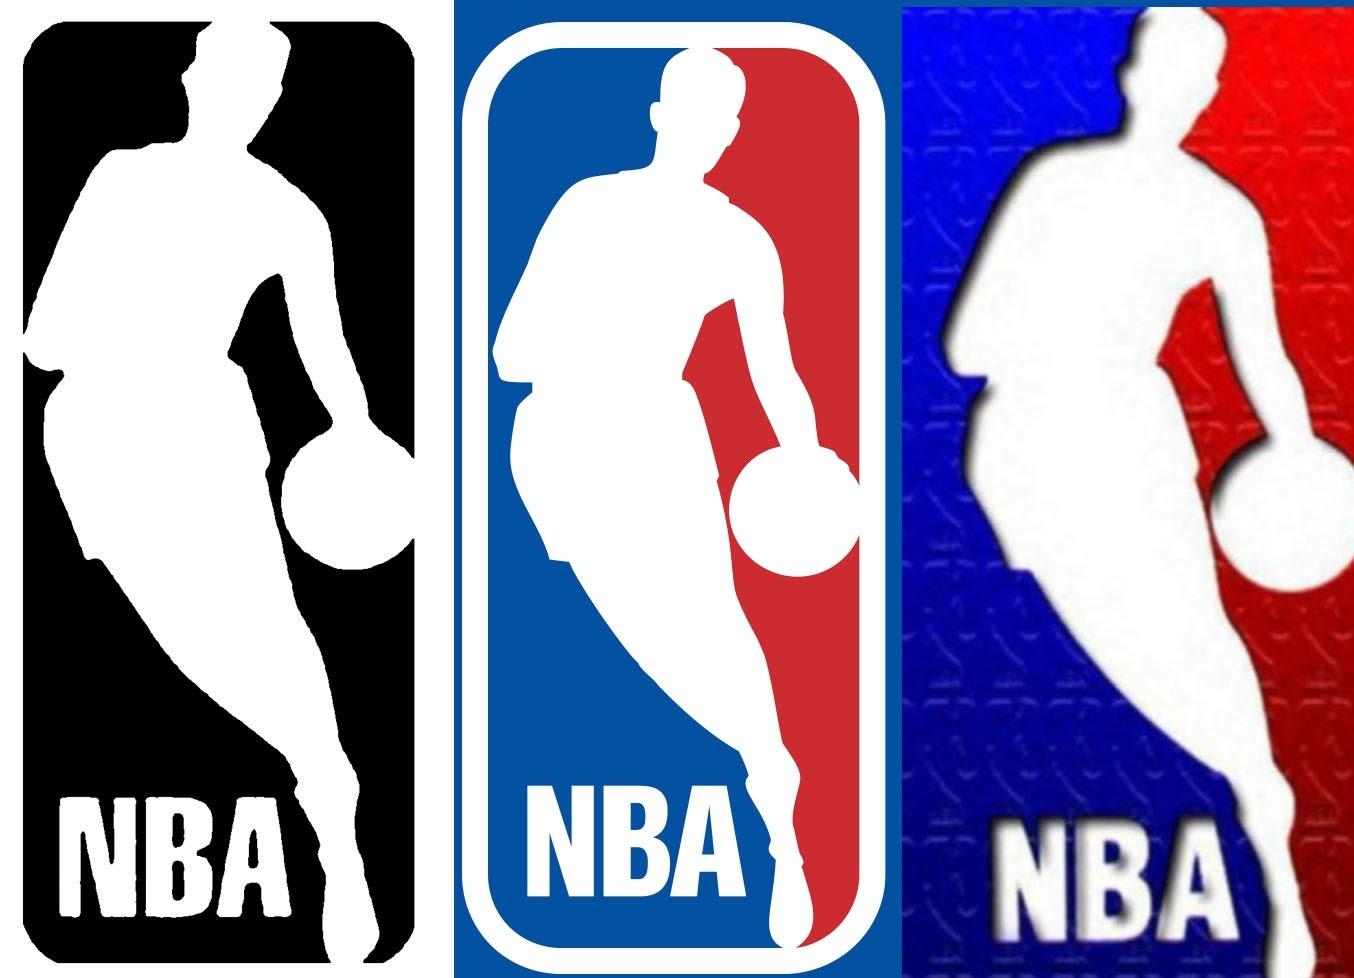 Logos Gallery Picture: Logo NBA